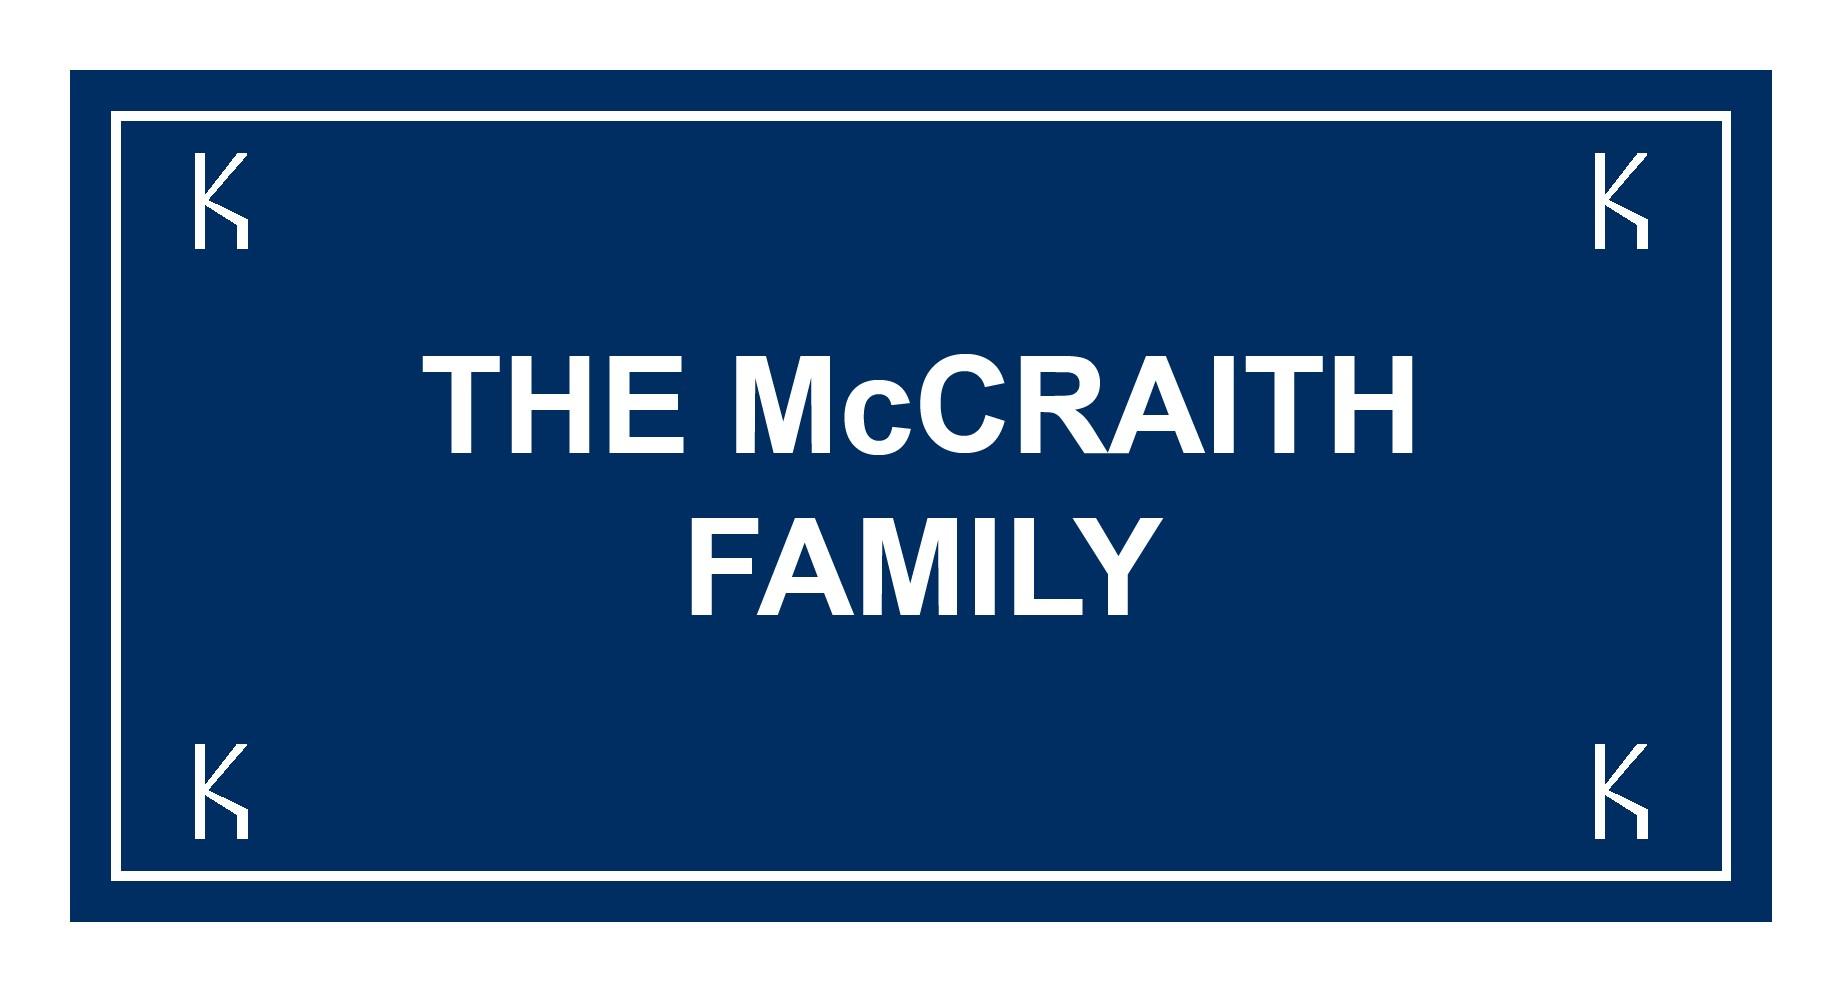 McCraith